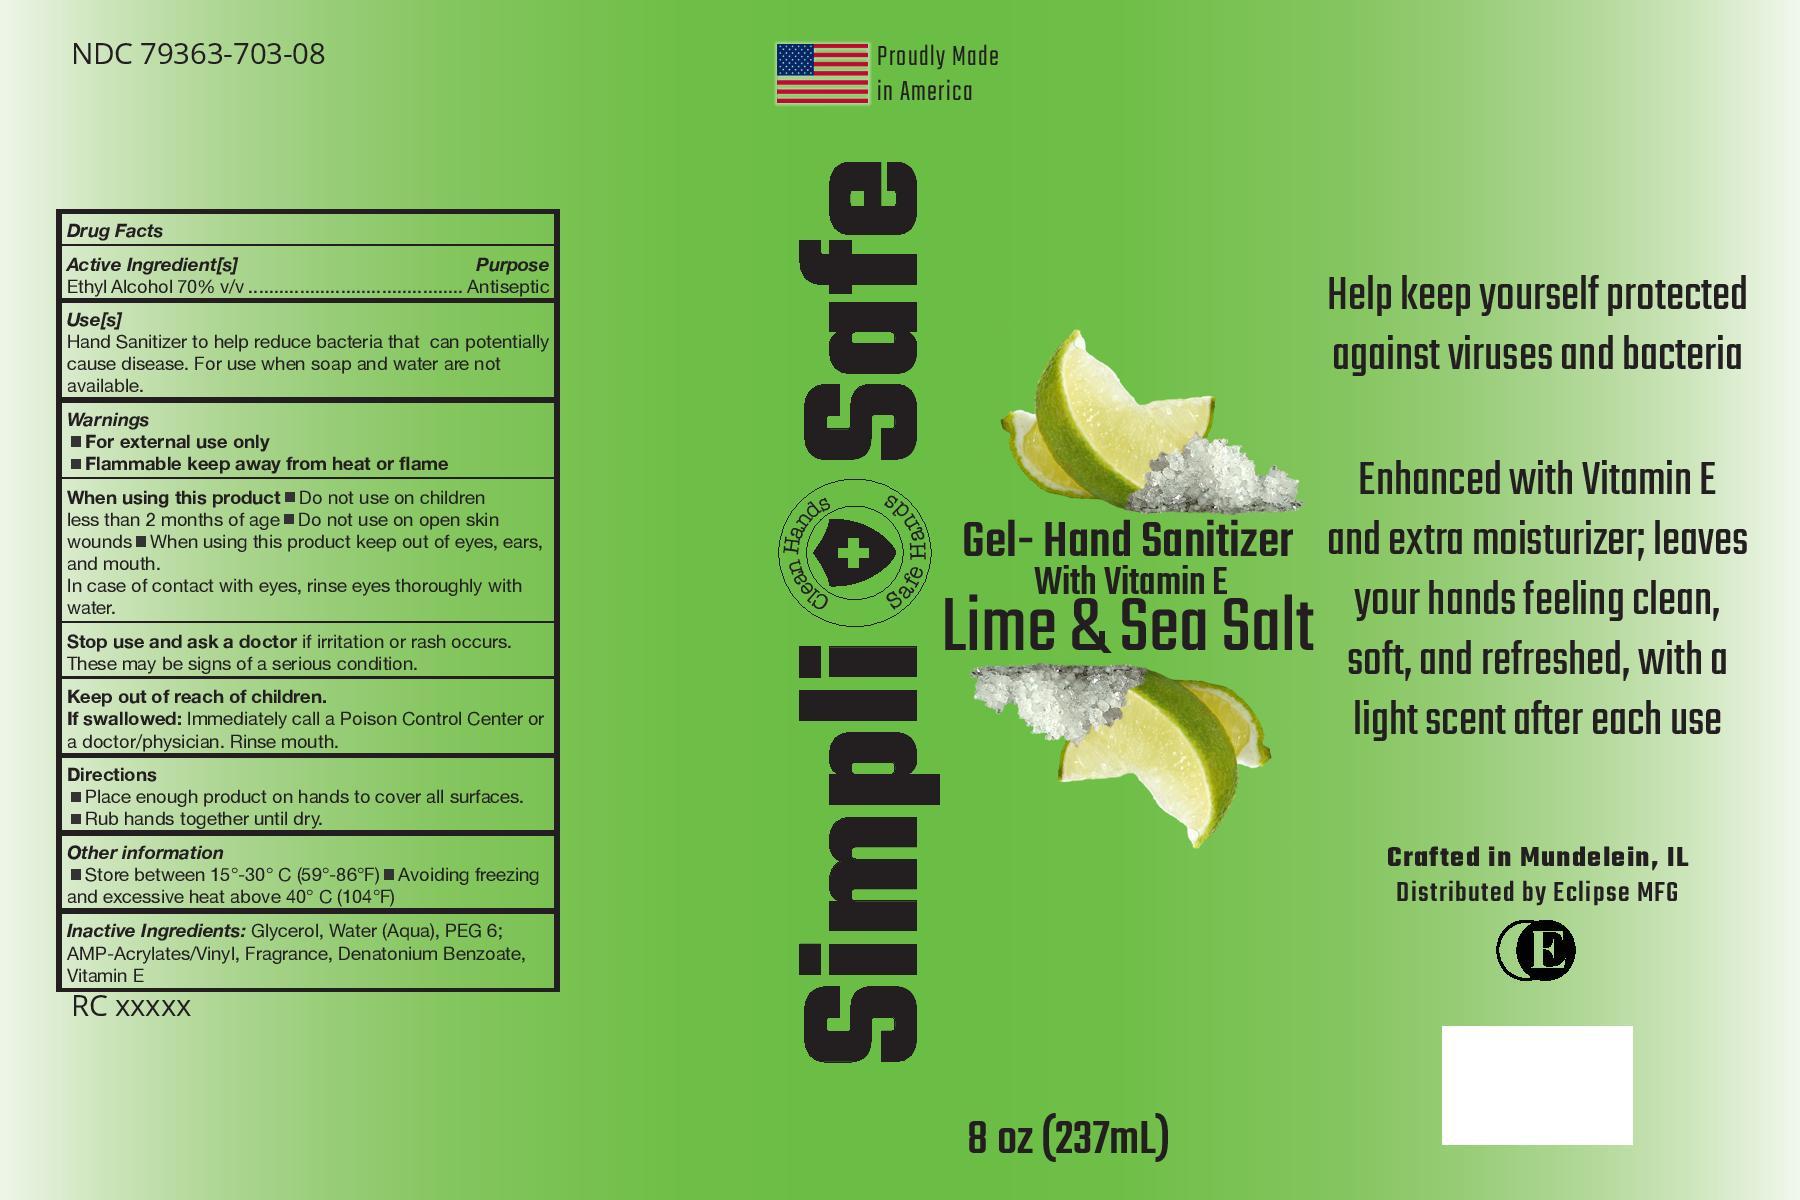 Simpli_Safe_LimeSeaSalt with Vit E 8oz